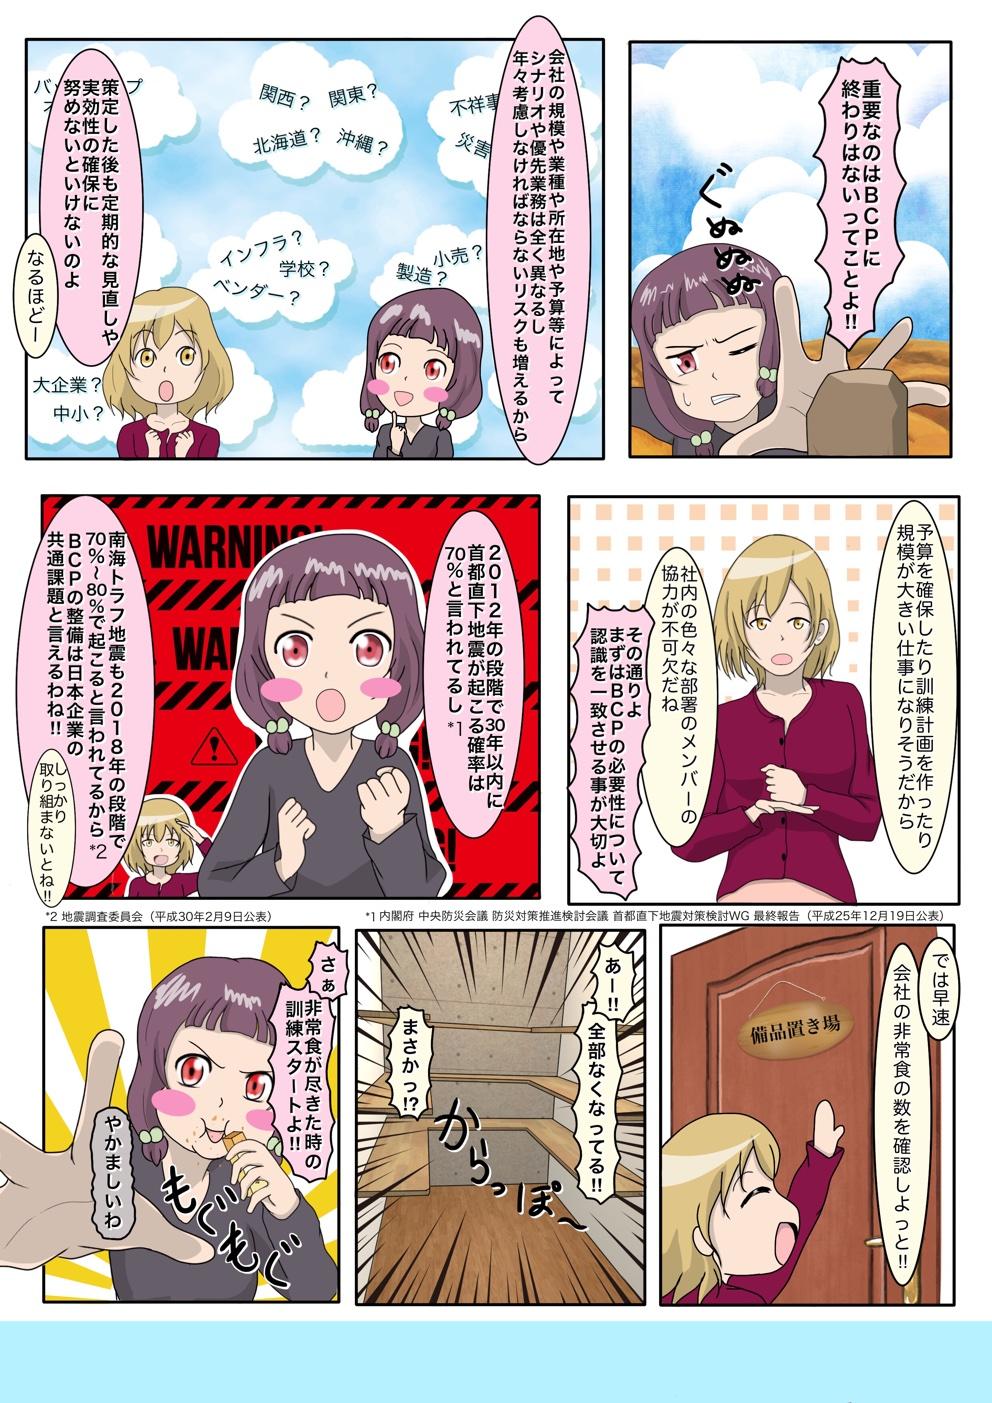 f:id:houmu_comic:20180820211225j:plain